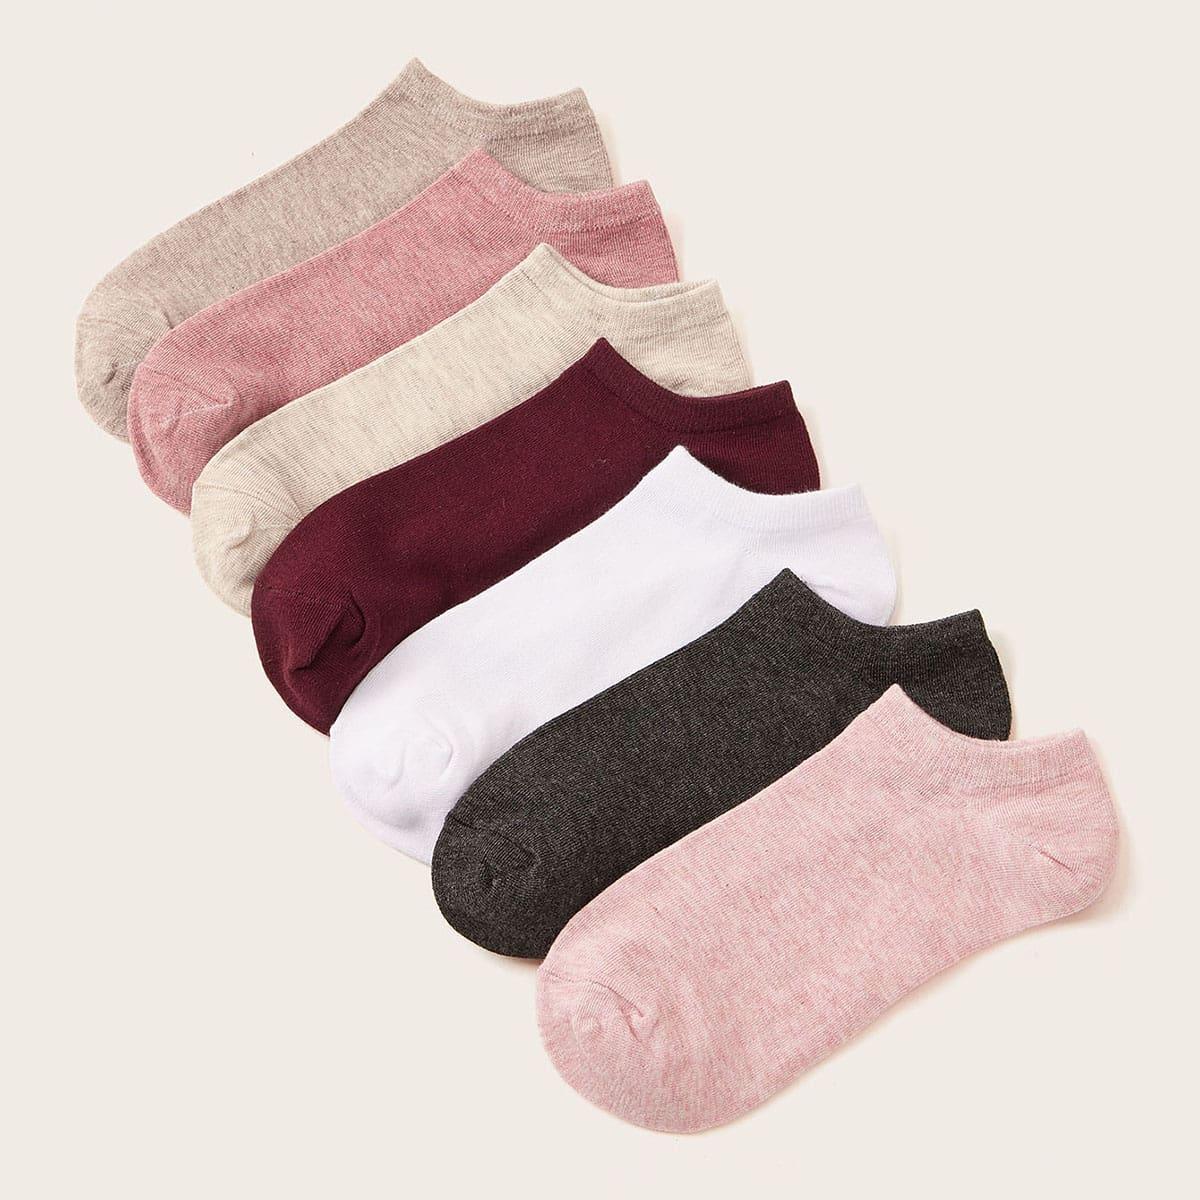 7pairs Simple Ankle Socks